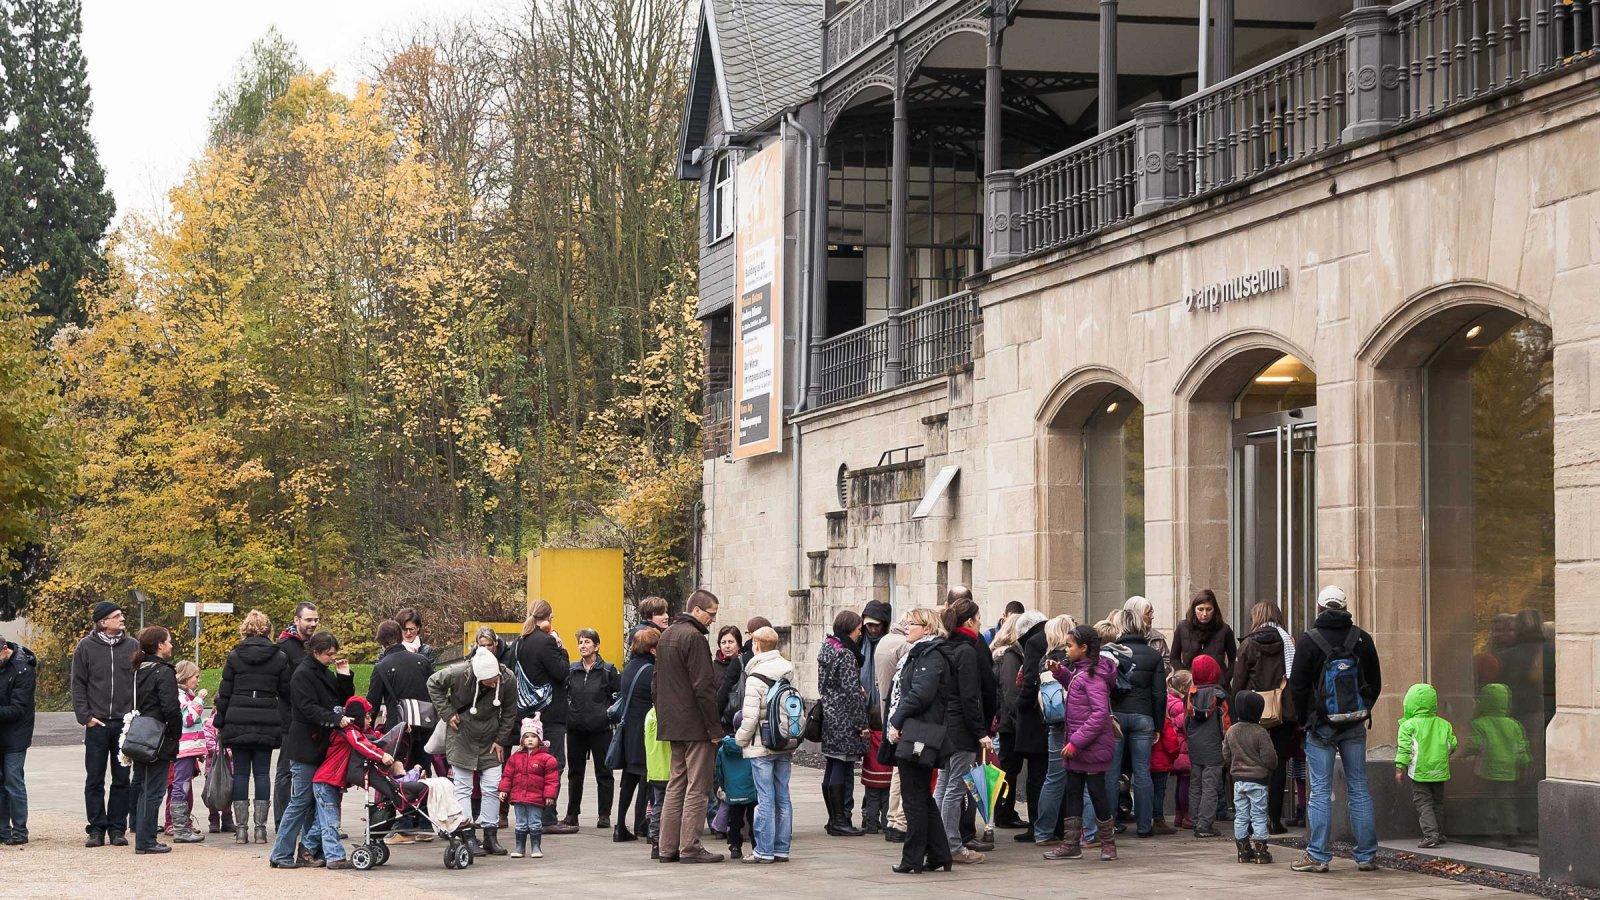 Besucherschlange vorm Eingang des Museums © Arp Museum Bahnhof Rolandseck, Foto: Sebastian Frankowski